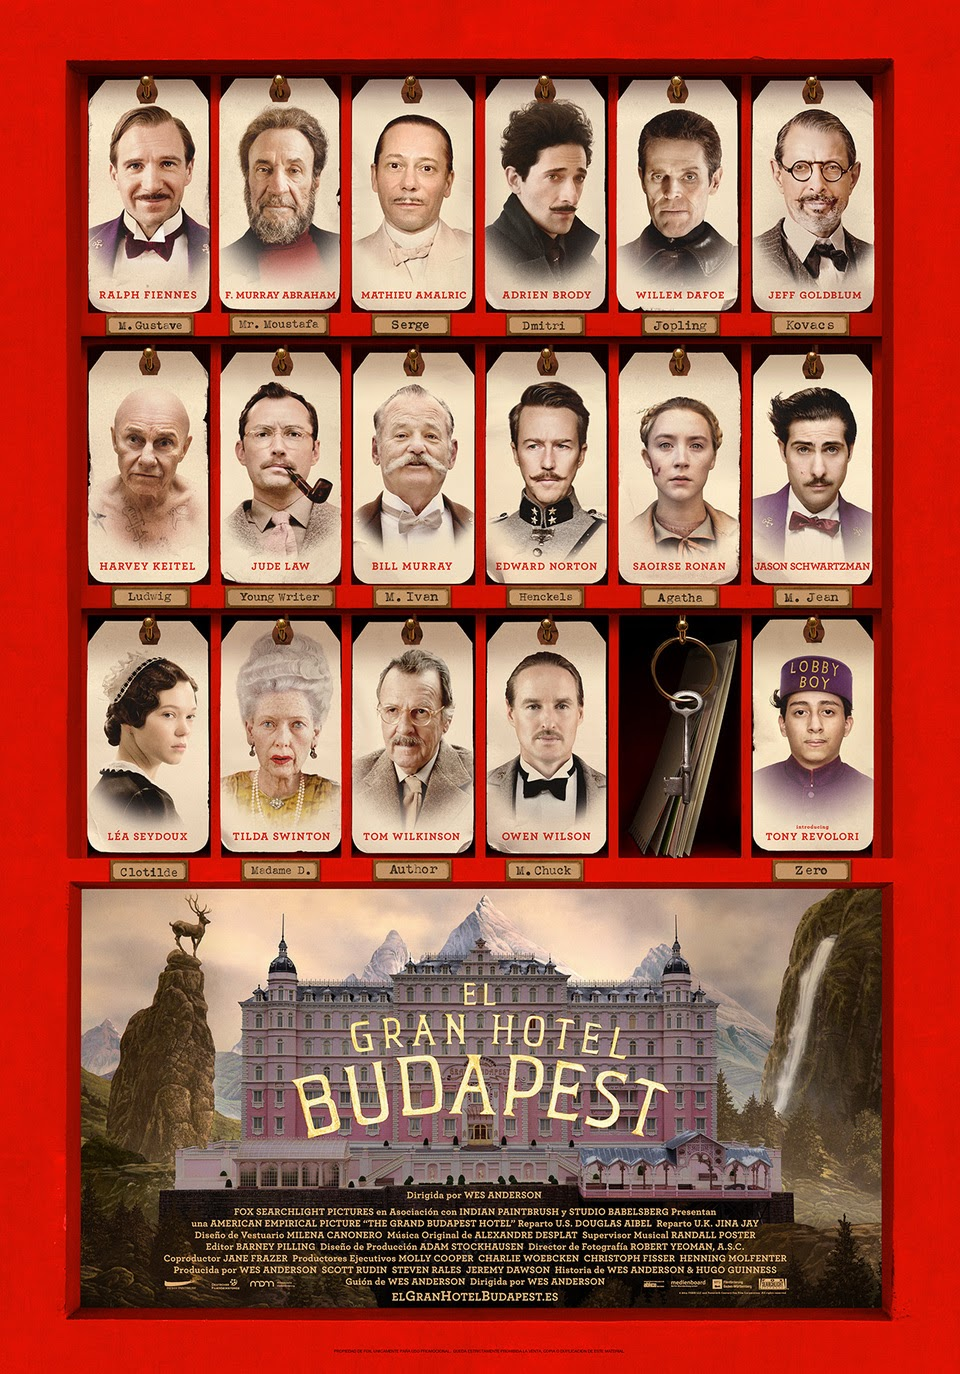 http://accionycine.blogspot.com.es/2014/04/el-gran-hotel-budapest-wes-anderson-nos.html